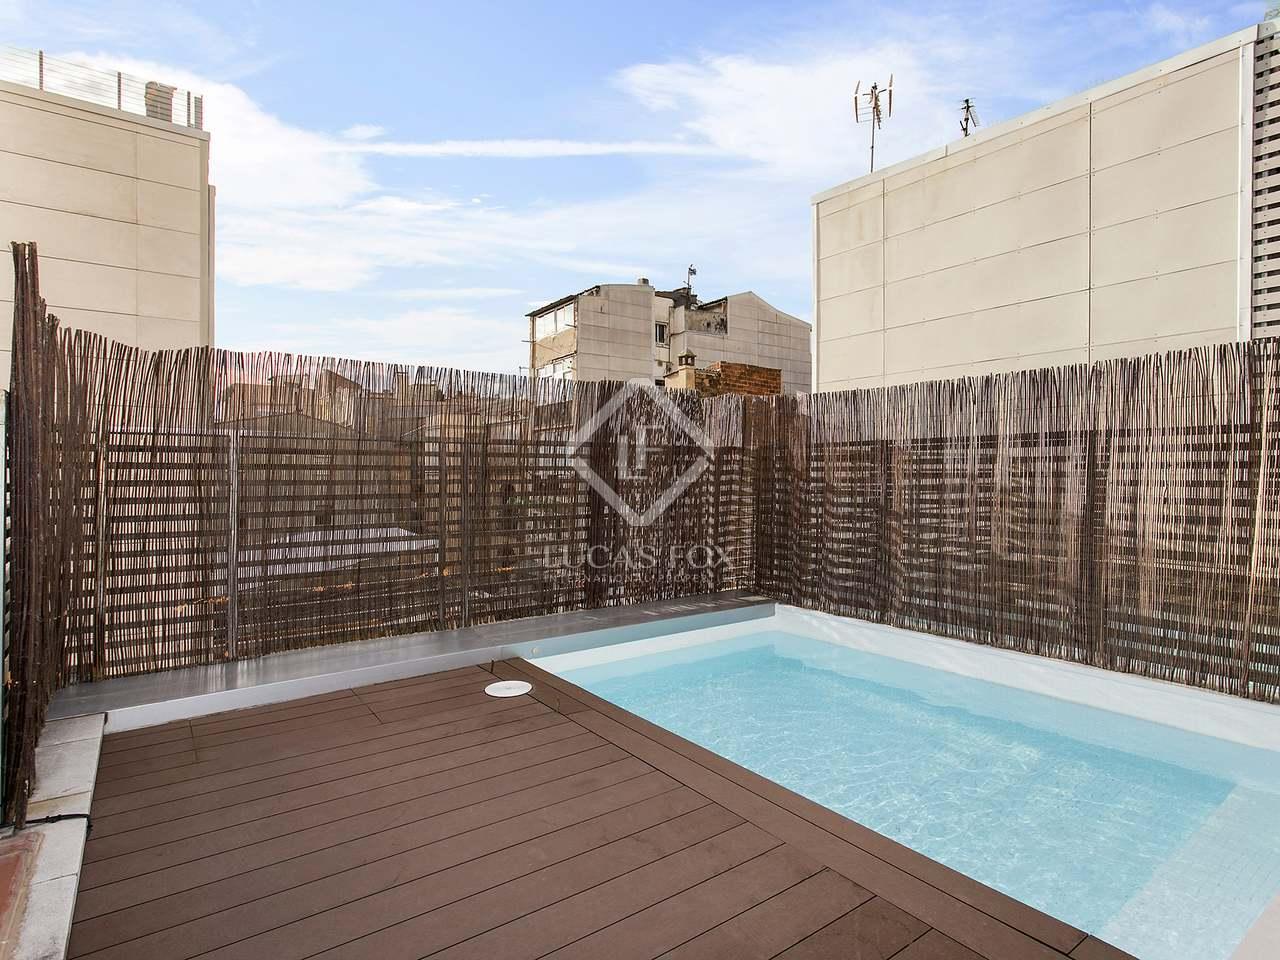 Casa de 140m en alquiler en poblenou barcelona for Alquiler casa jardin barcelona